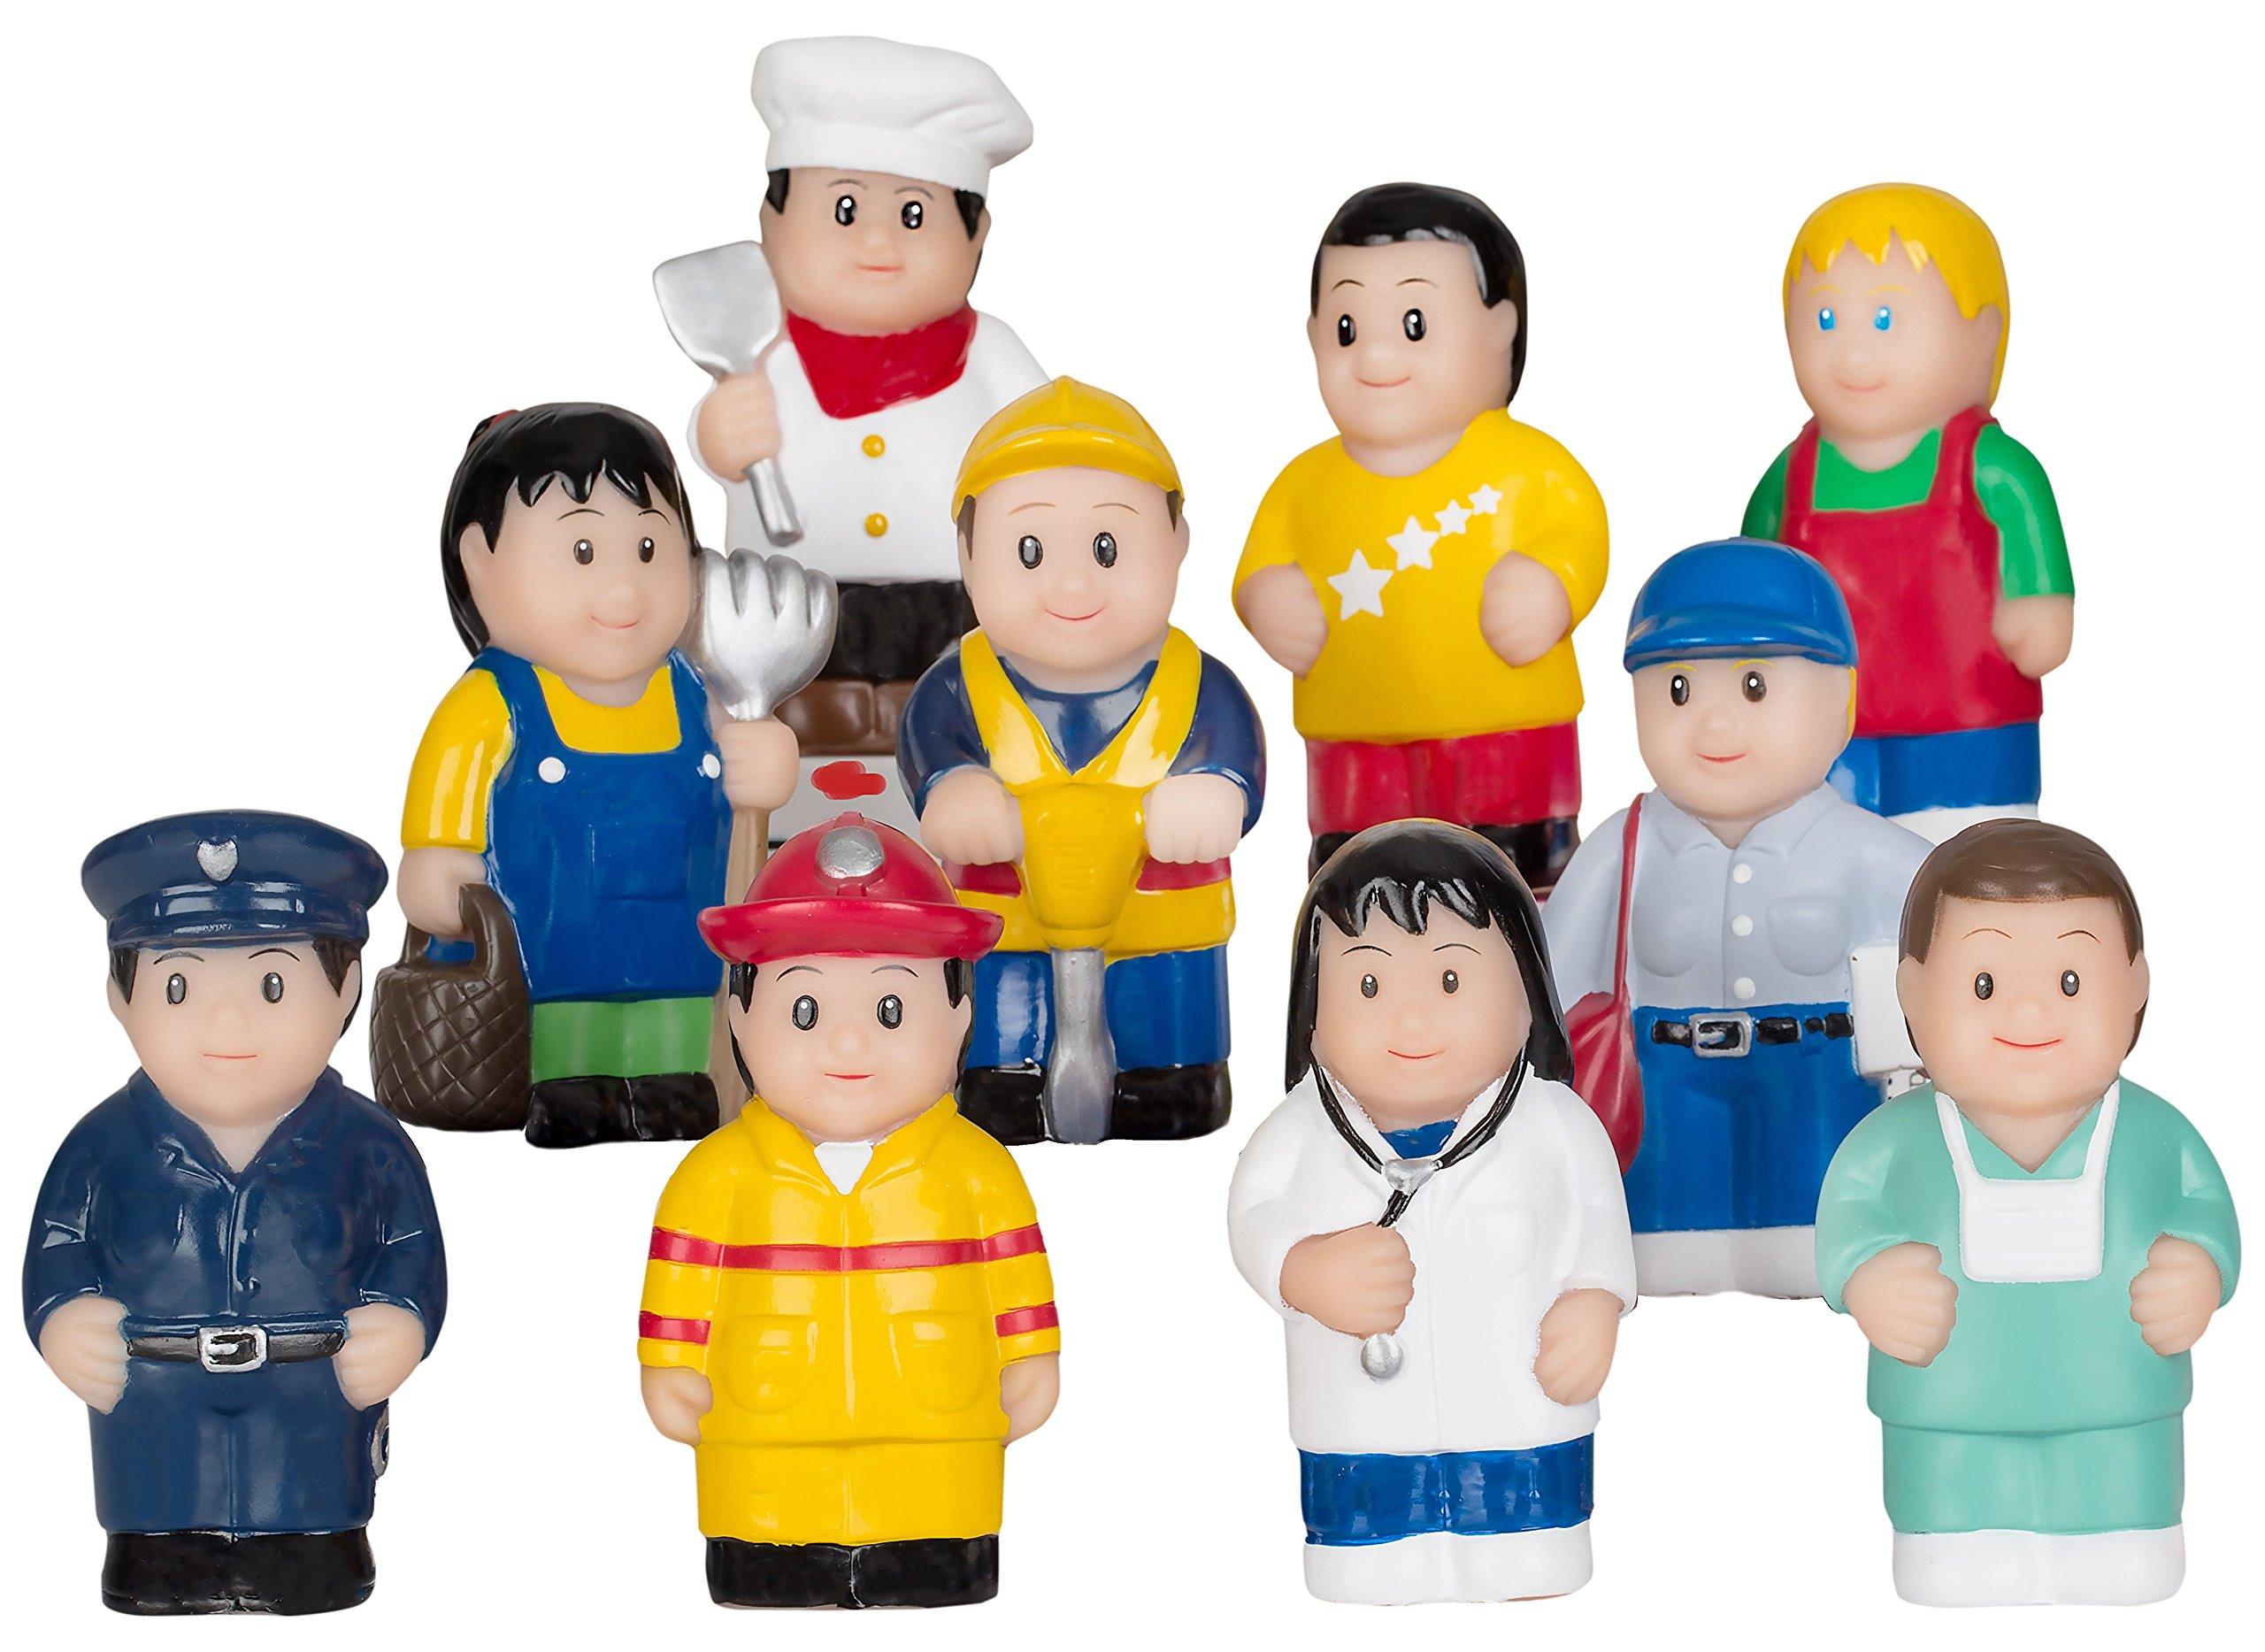 cheap fireman figures toys find fireman figures toys deals on line